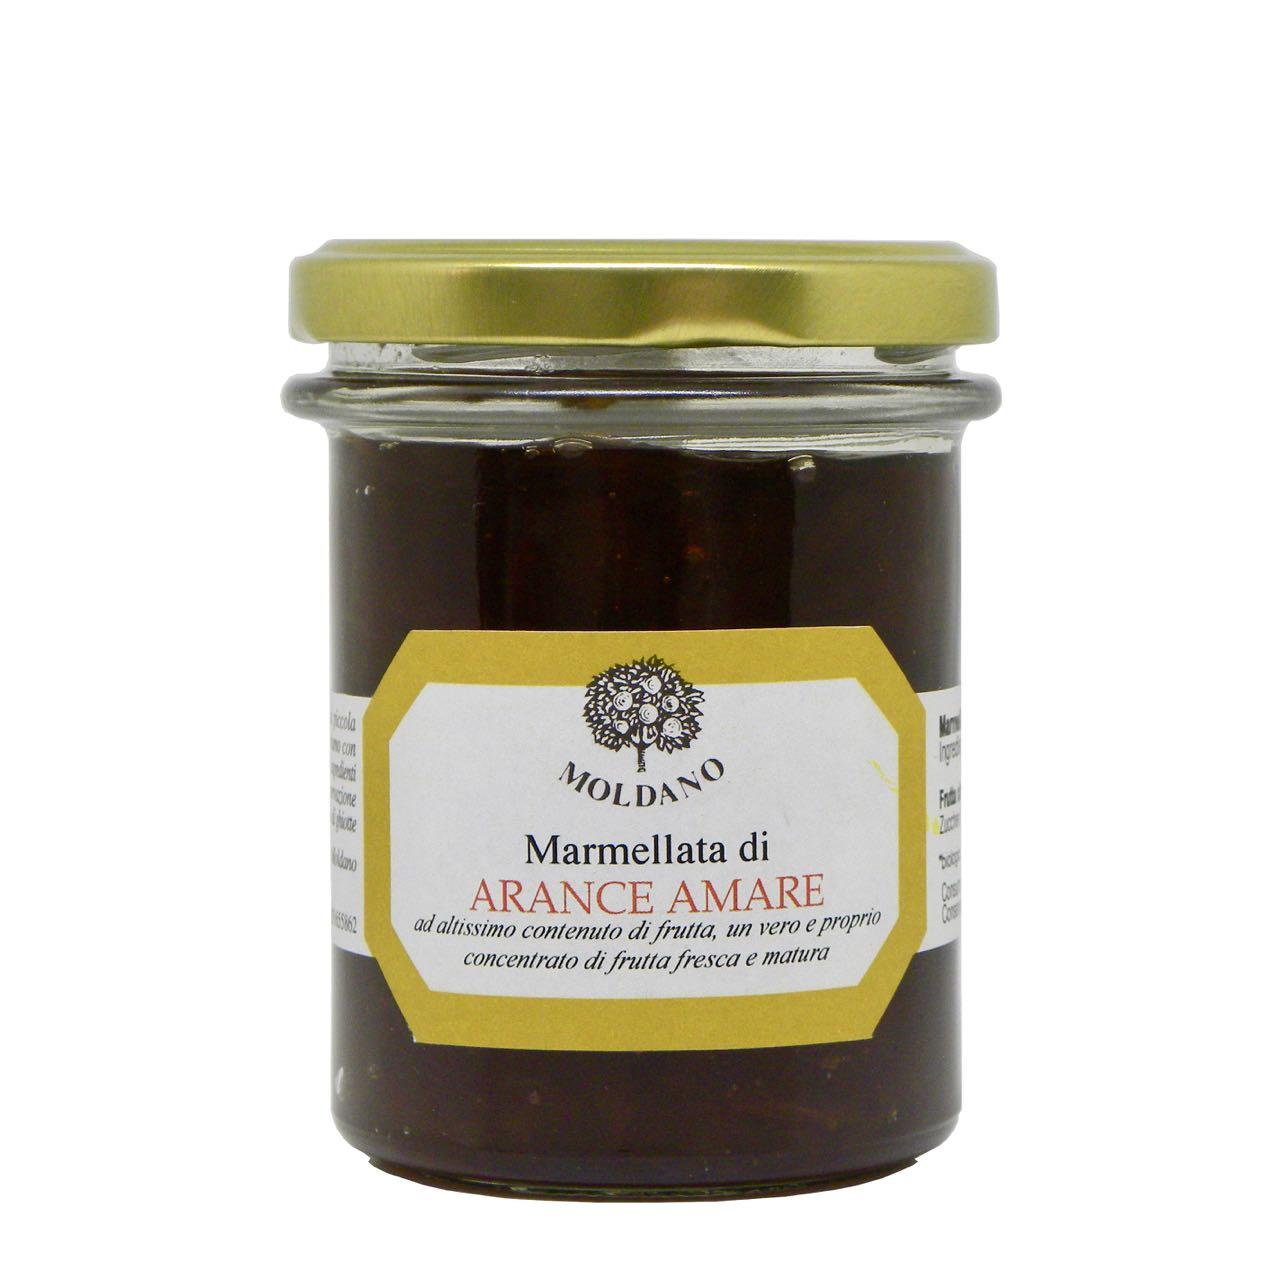 Fattoria Moldano marmellata arance amare – bitter orange marmelade –  Gustorotondo Italian food boutique – I migliori cibi online – Best Italian foods online – spesa online